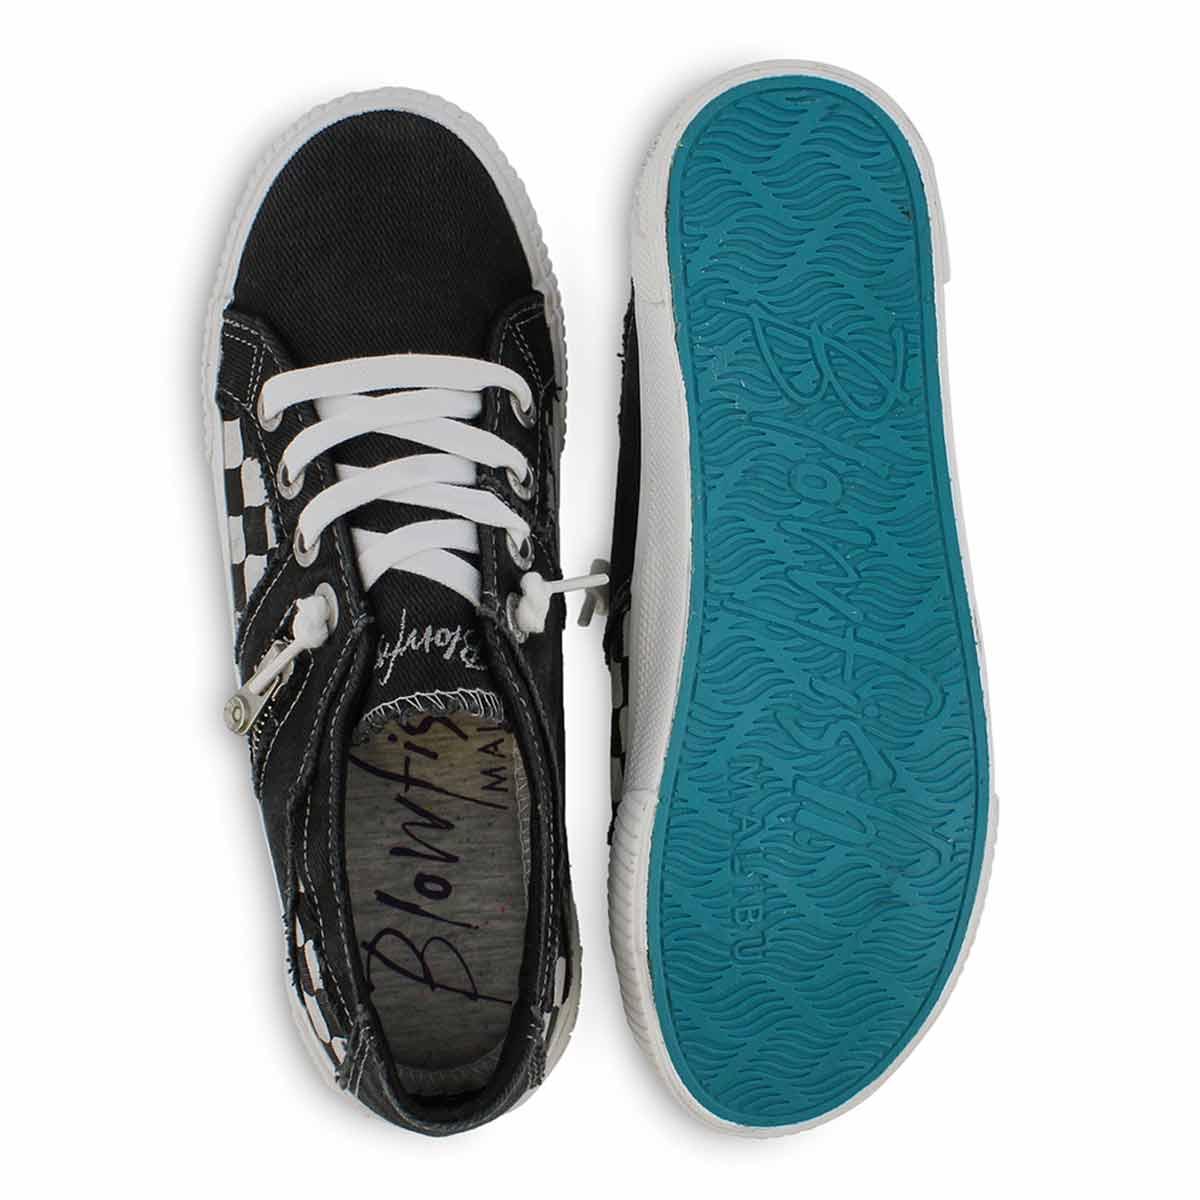 Women's FRUIT black lace up fashion sneakers